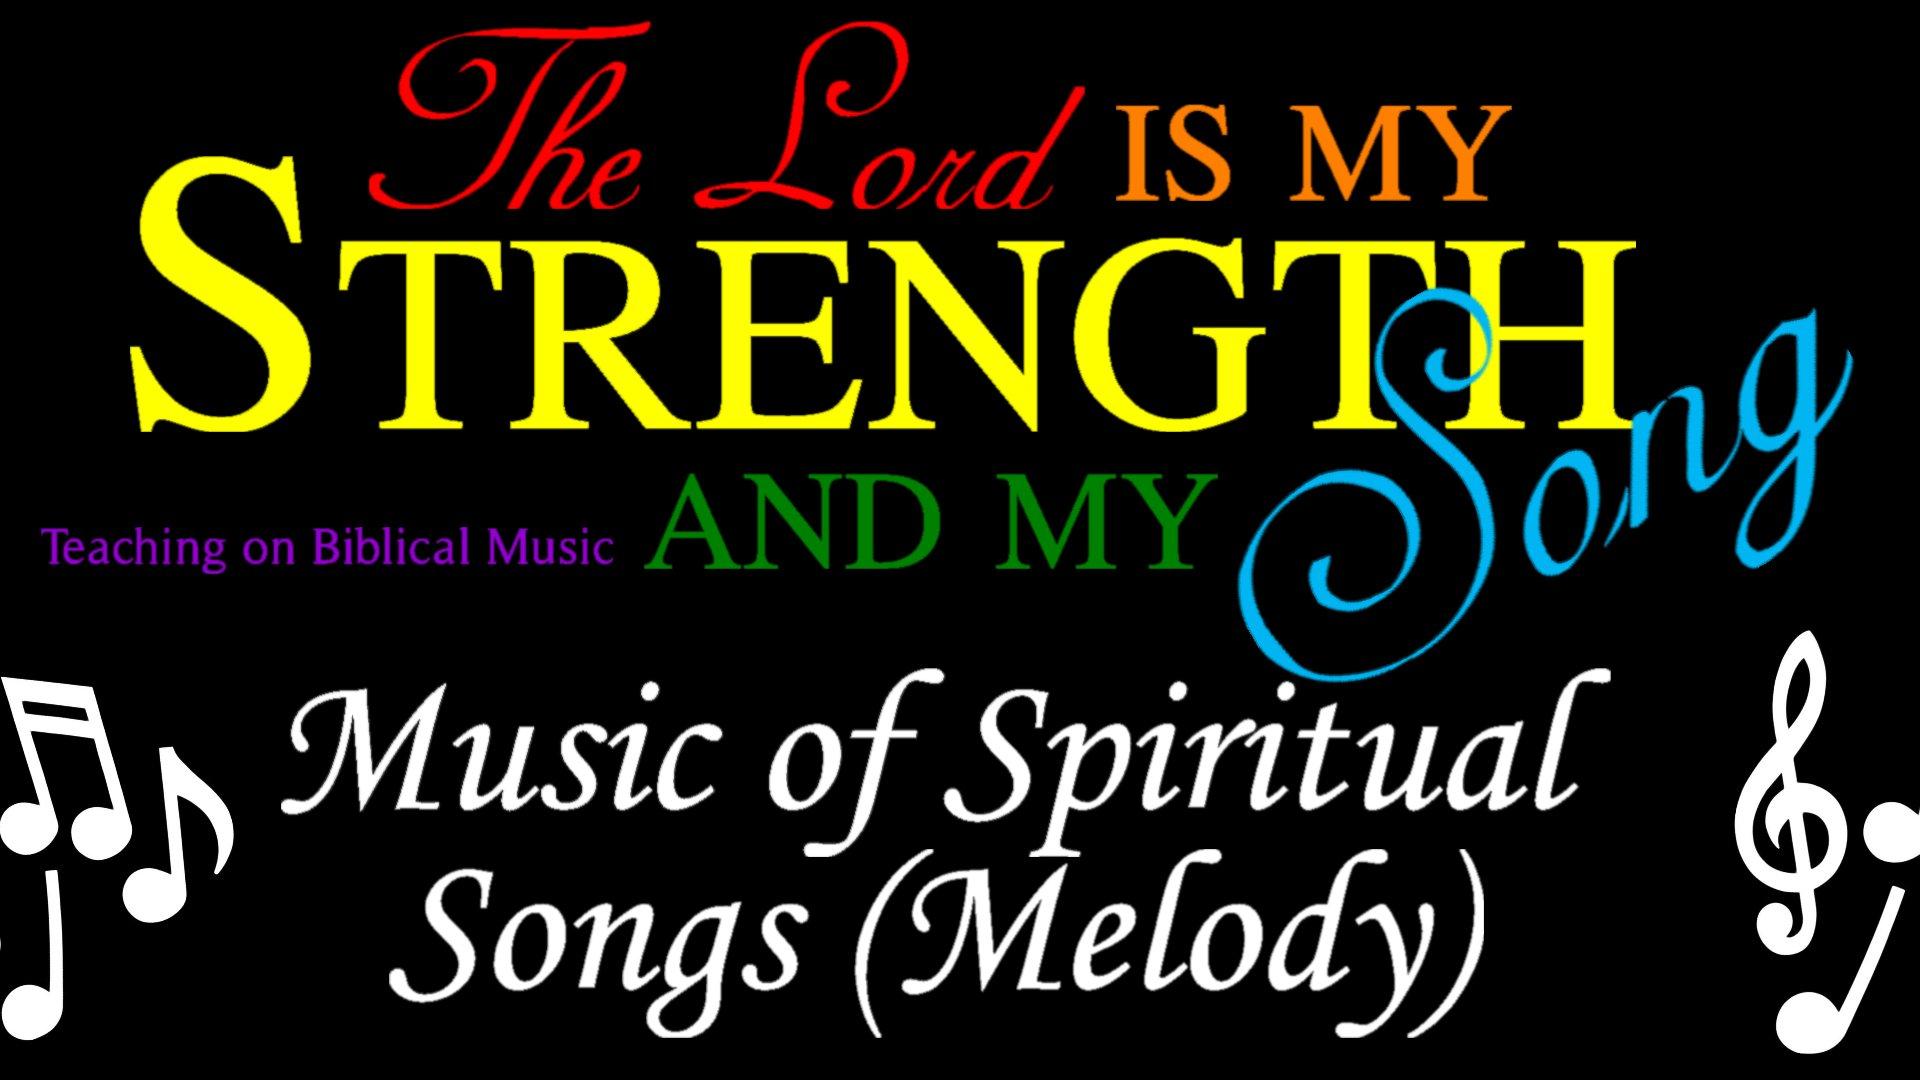 07 Music of Spiritual Songs (Melody)